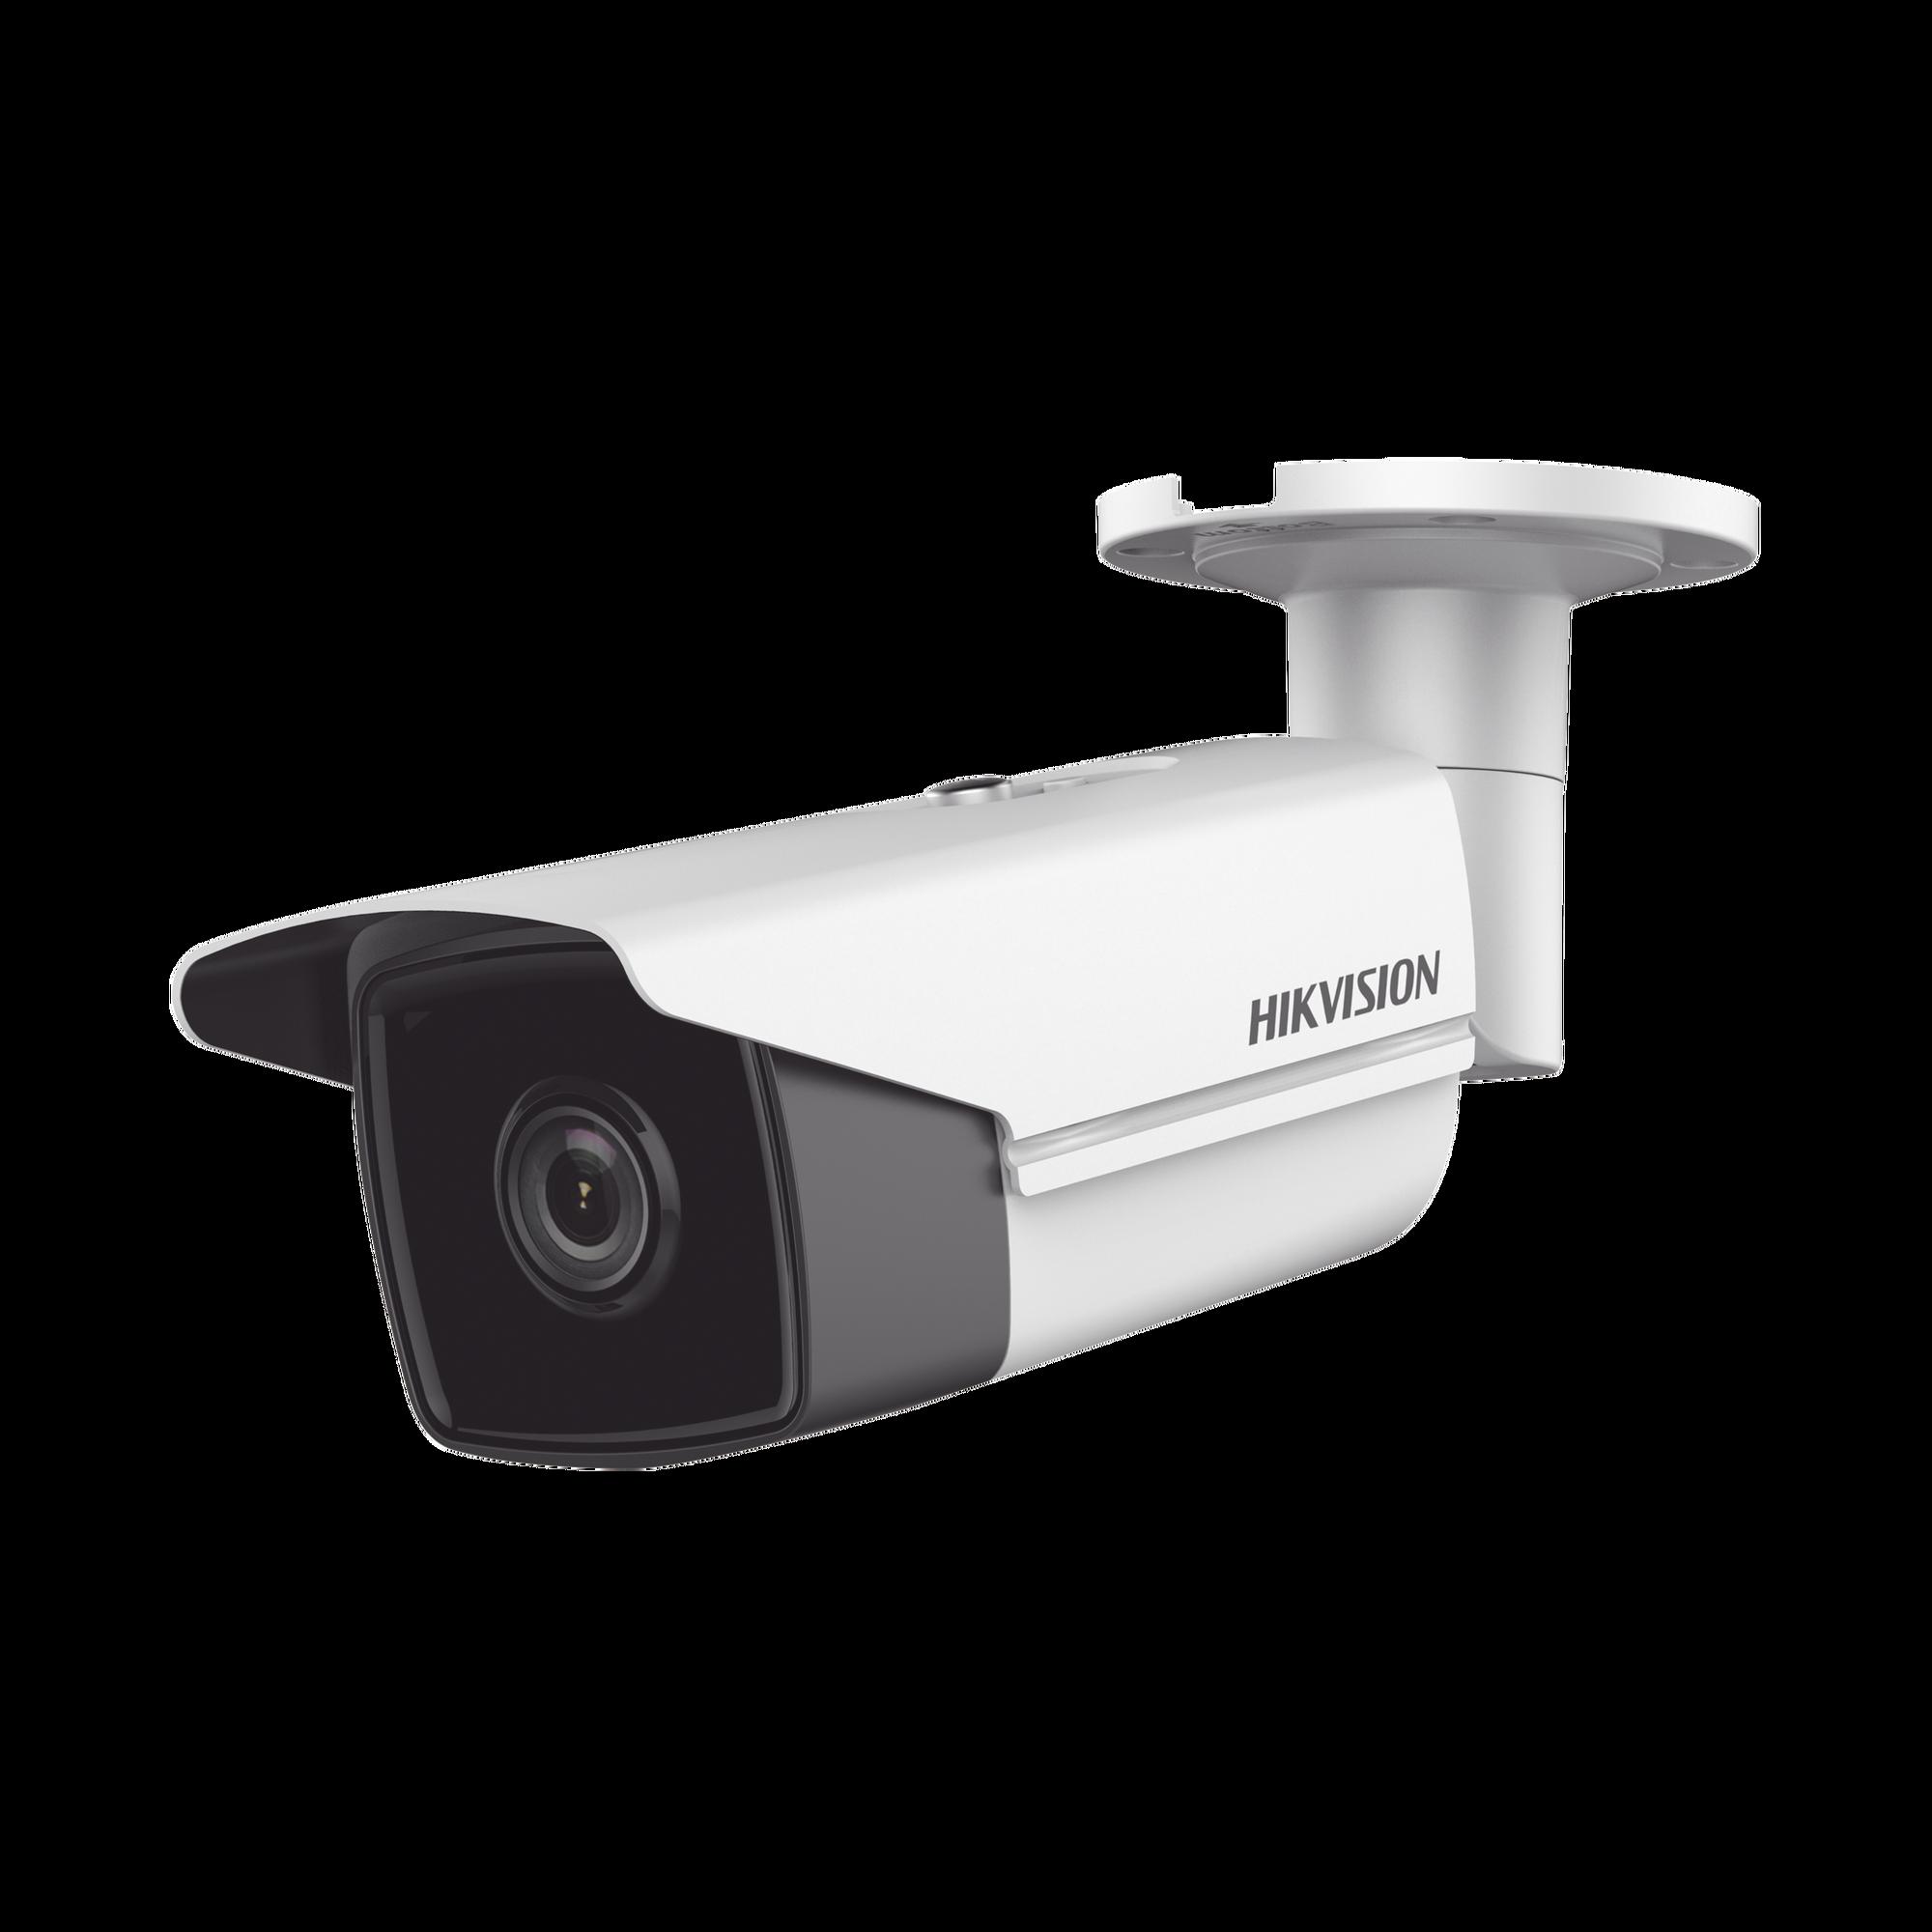 Bala IP 4 Megapixel / Lente 4 mm / 80 mts IR EXIR / IP67 / WDR 120 dB / PoE / Videoanaliticos (Filtro de Falsas Alarmas) / Ultra Baja Iluminación